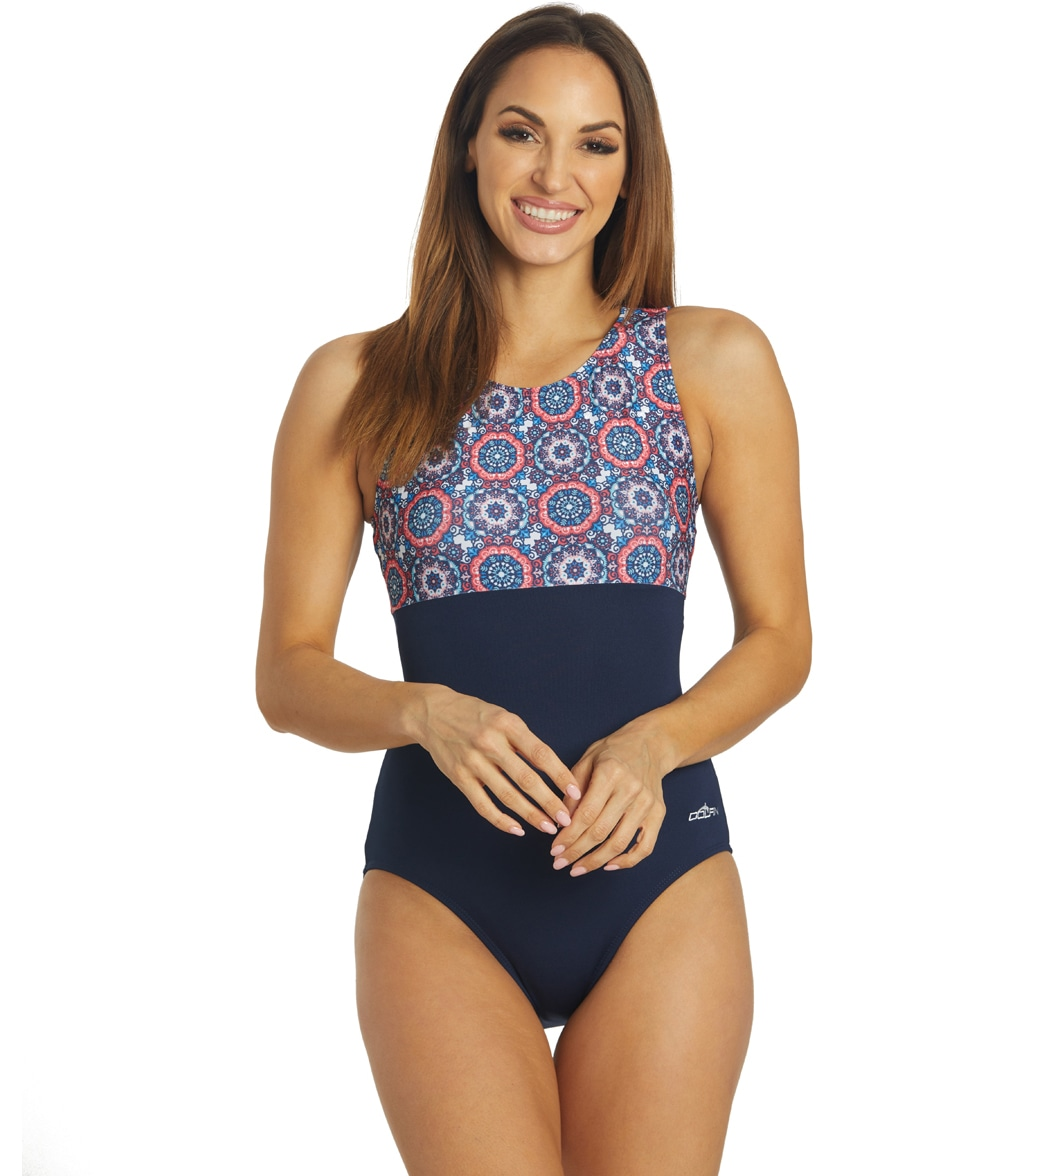 Dolfin Women's Aquashape Mosaic Block High Neck Clasp Back One Piece Swimsuit